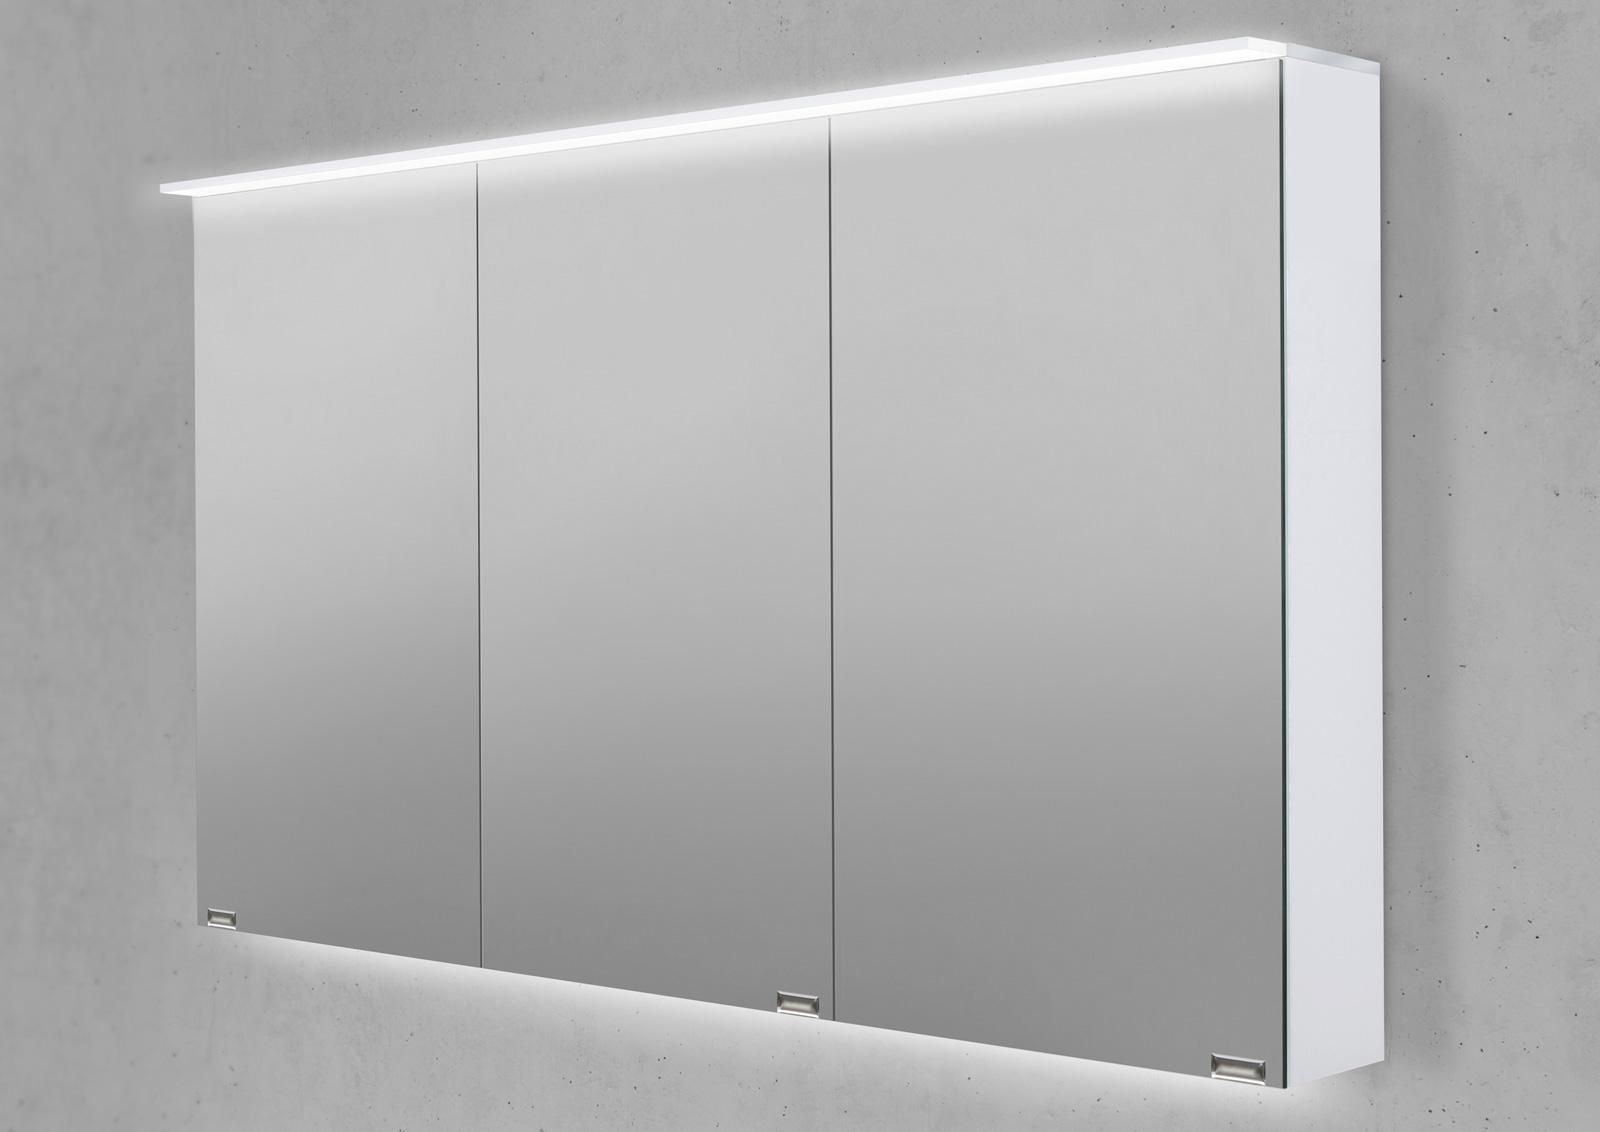 spiegelschrank 120 cm led acryl lichtplatte doppelseitig verspiegelt. Black Bedroom Furniture Sets. Home Design Ideas